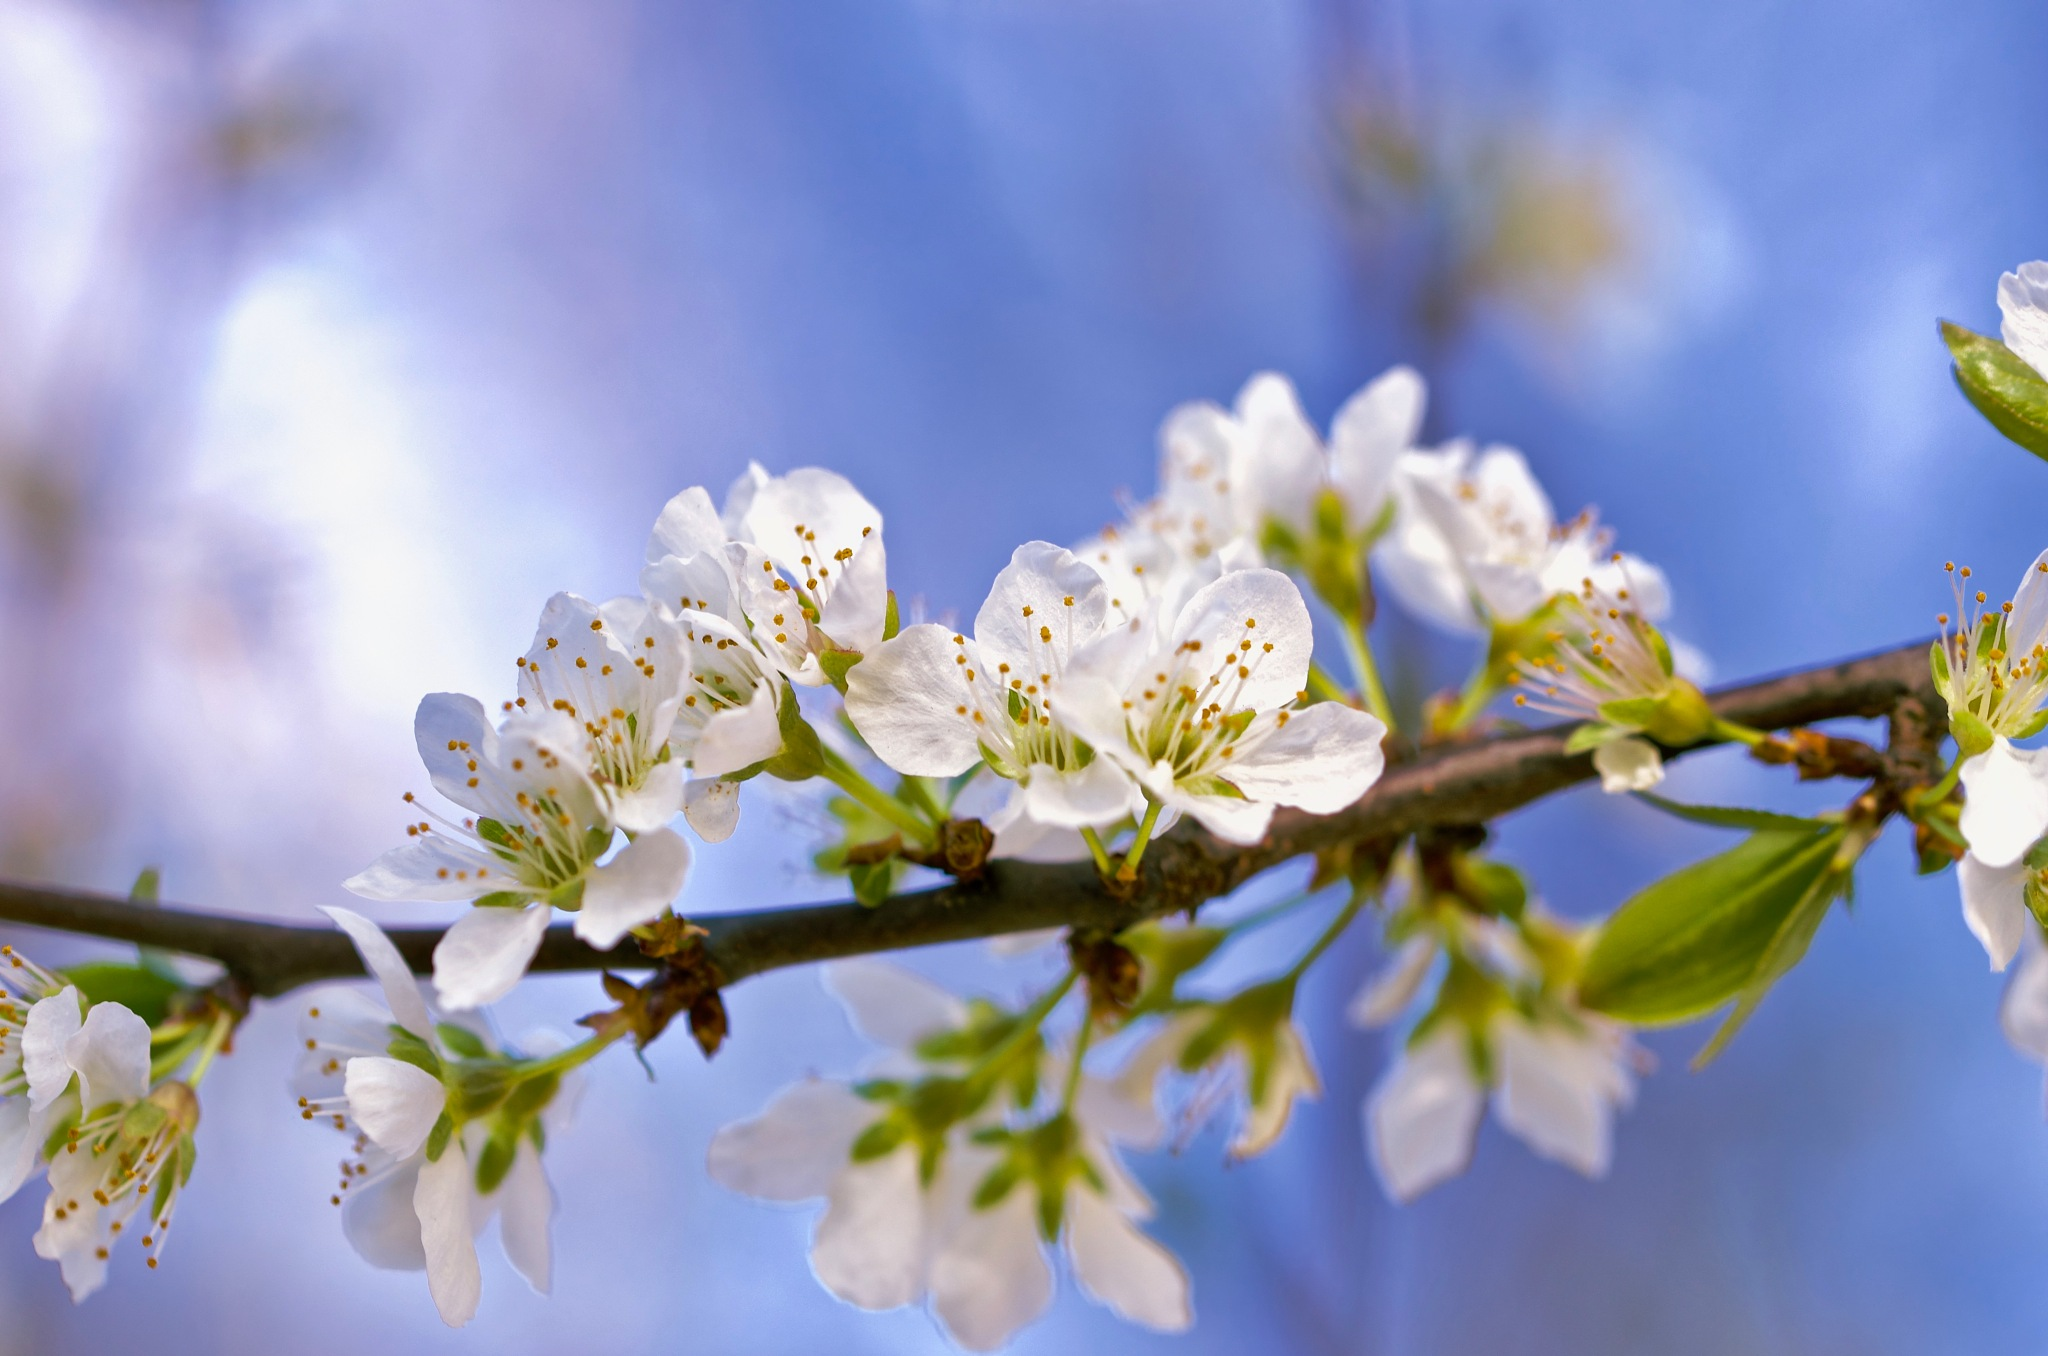 Plum blossoms by pam.simonsson